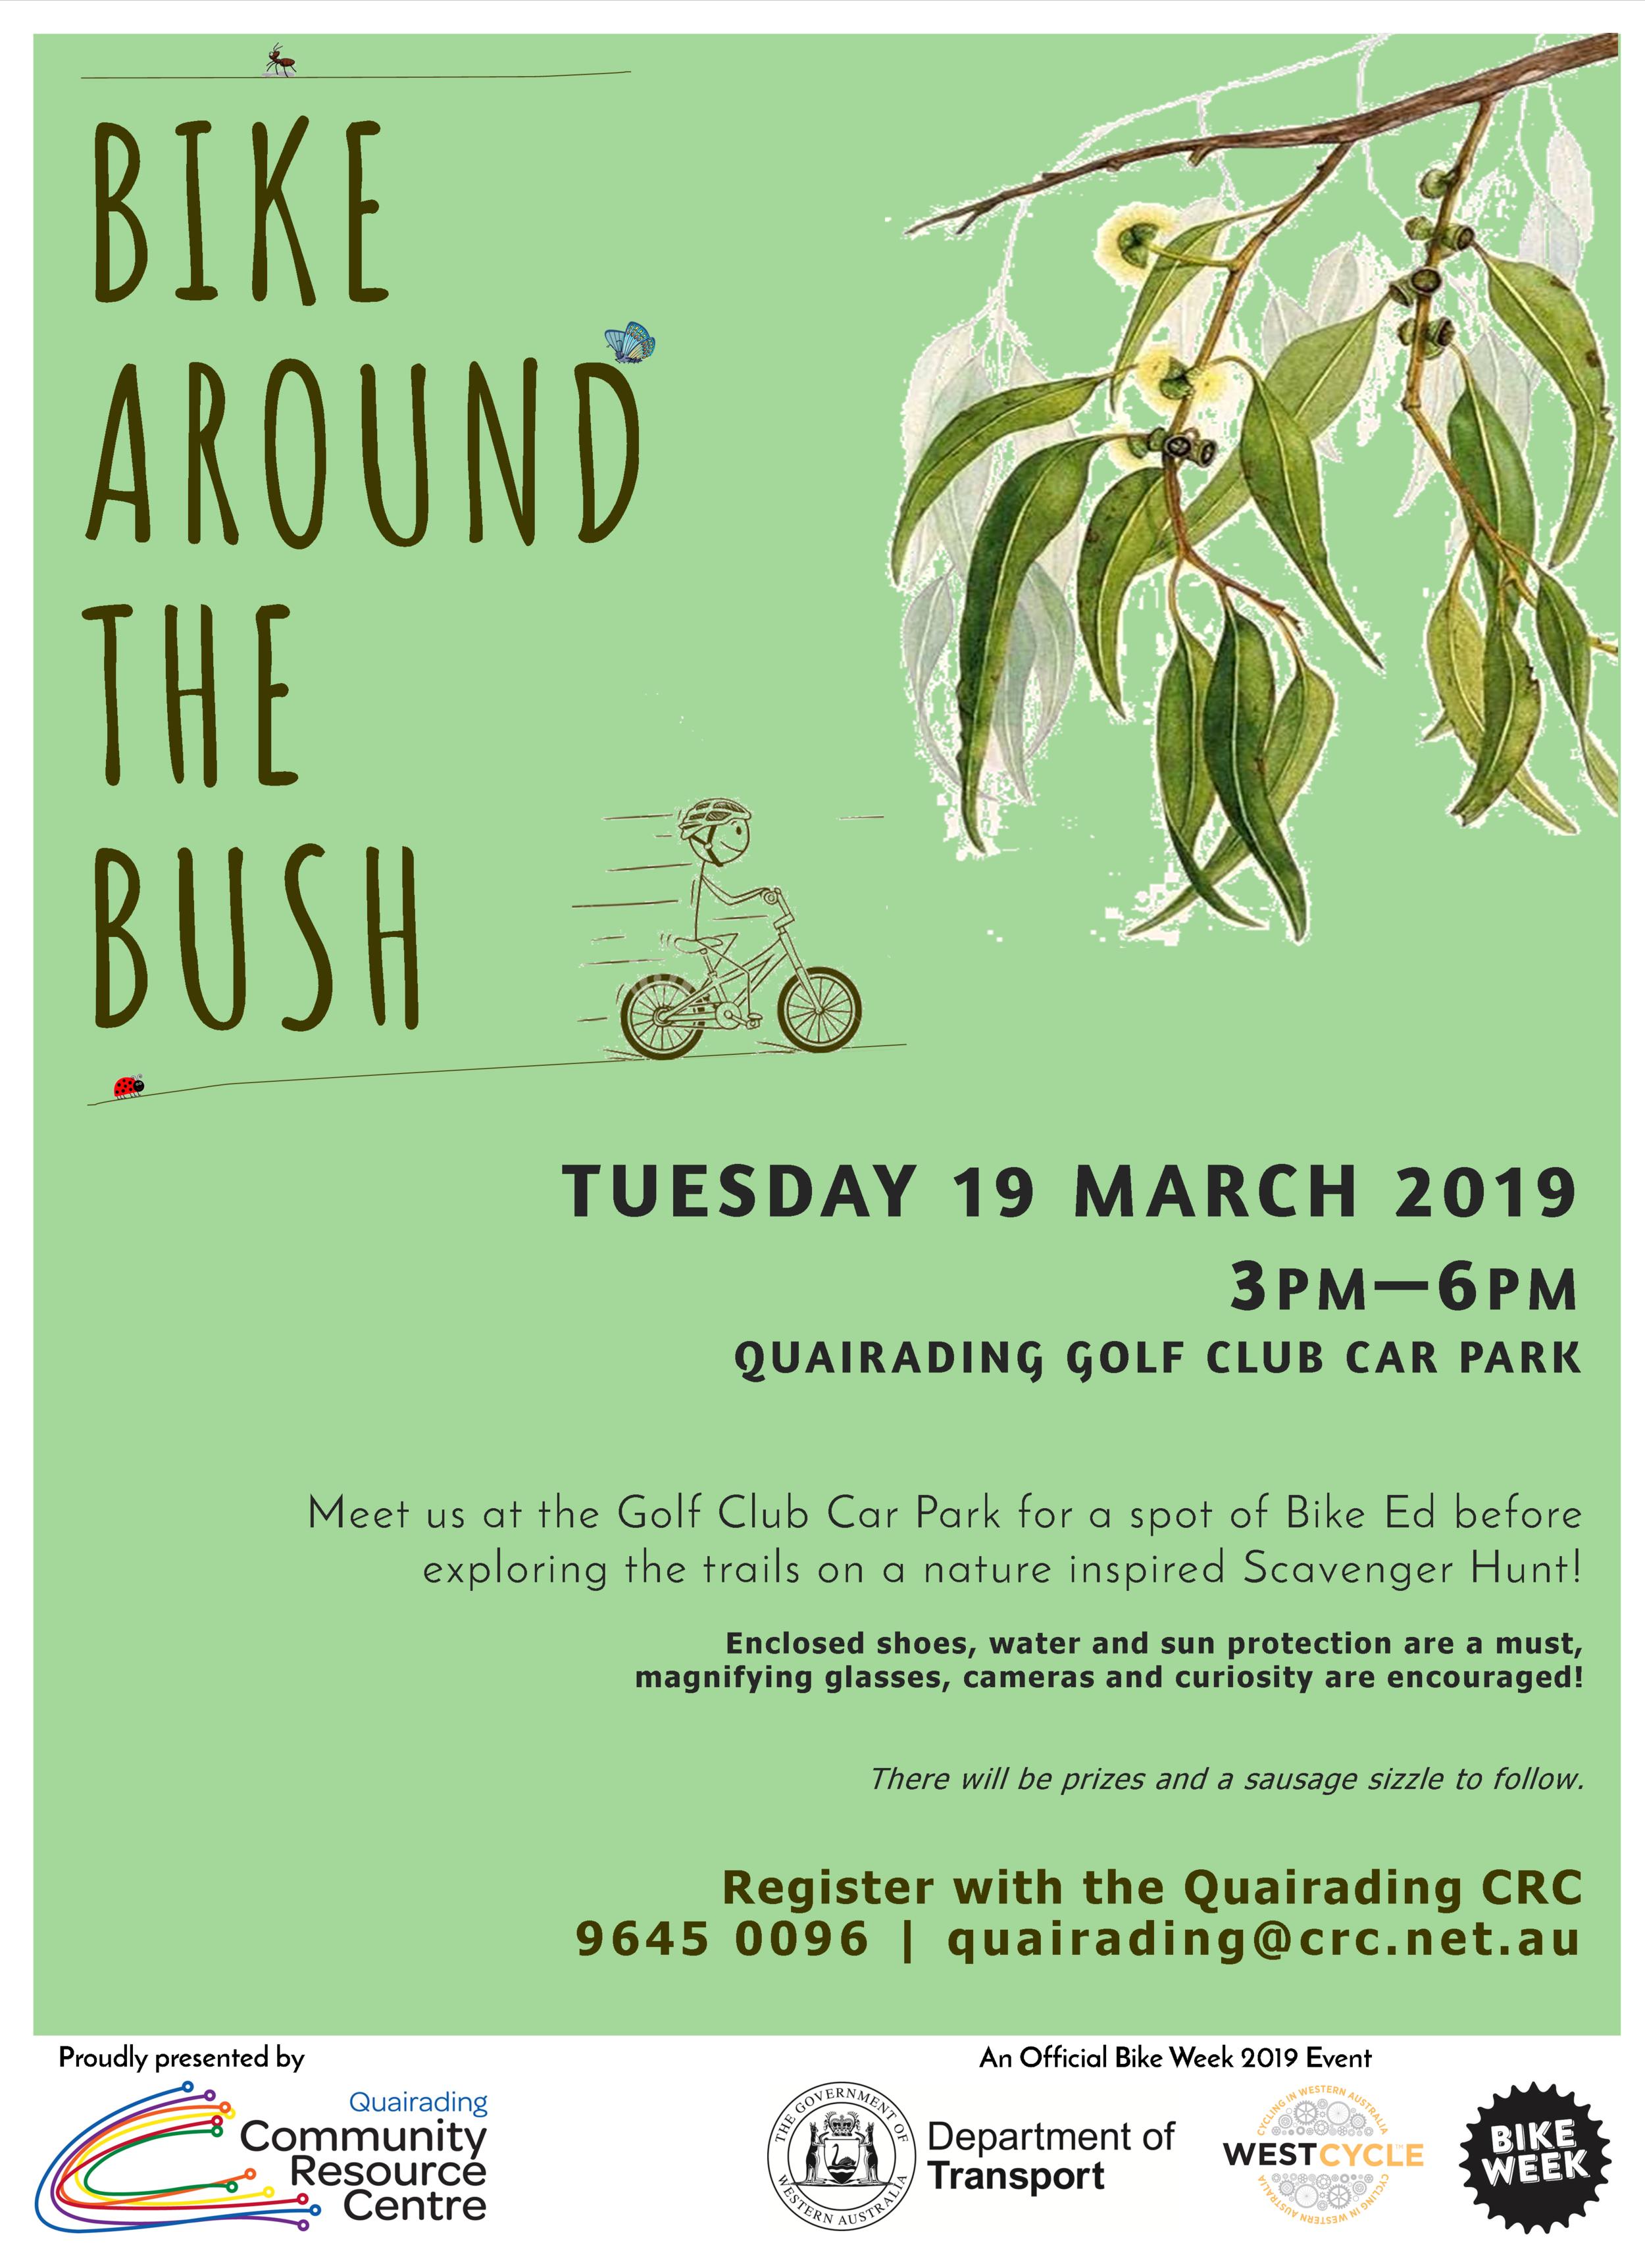 Quaraiding CRC  Bike Around The Bush Poster.png